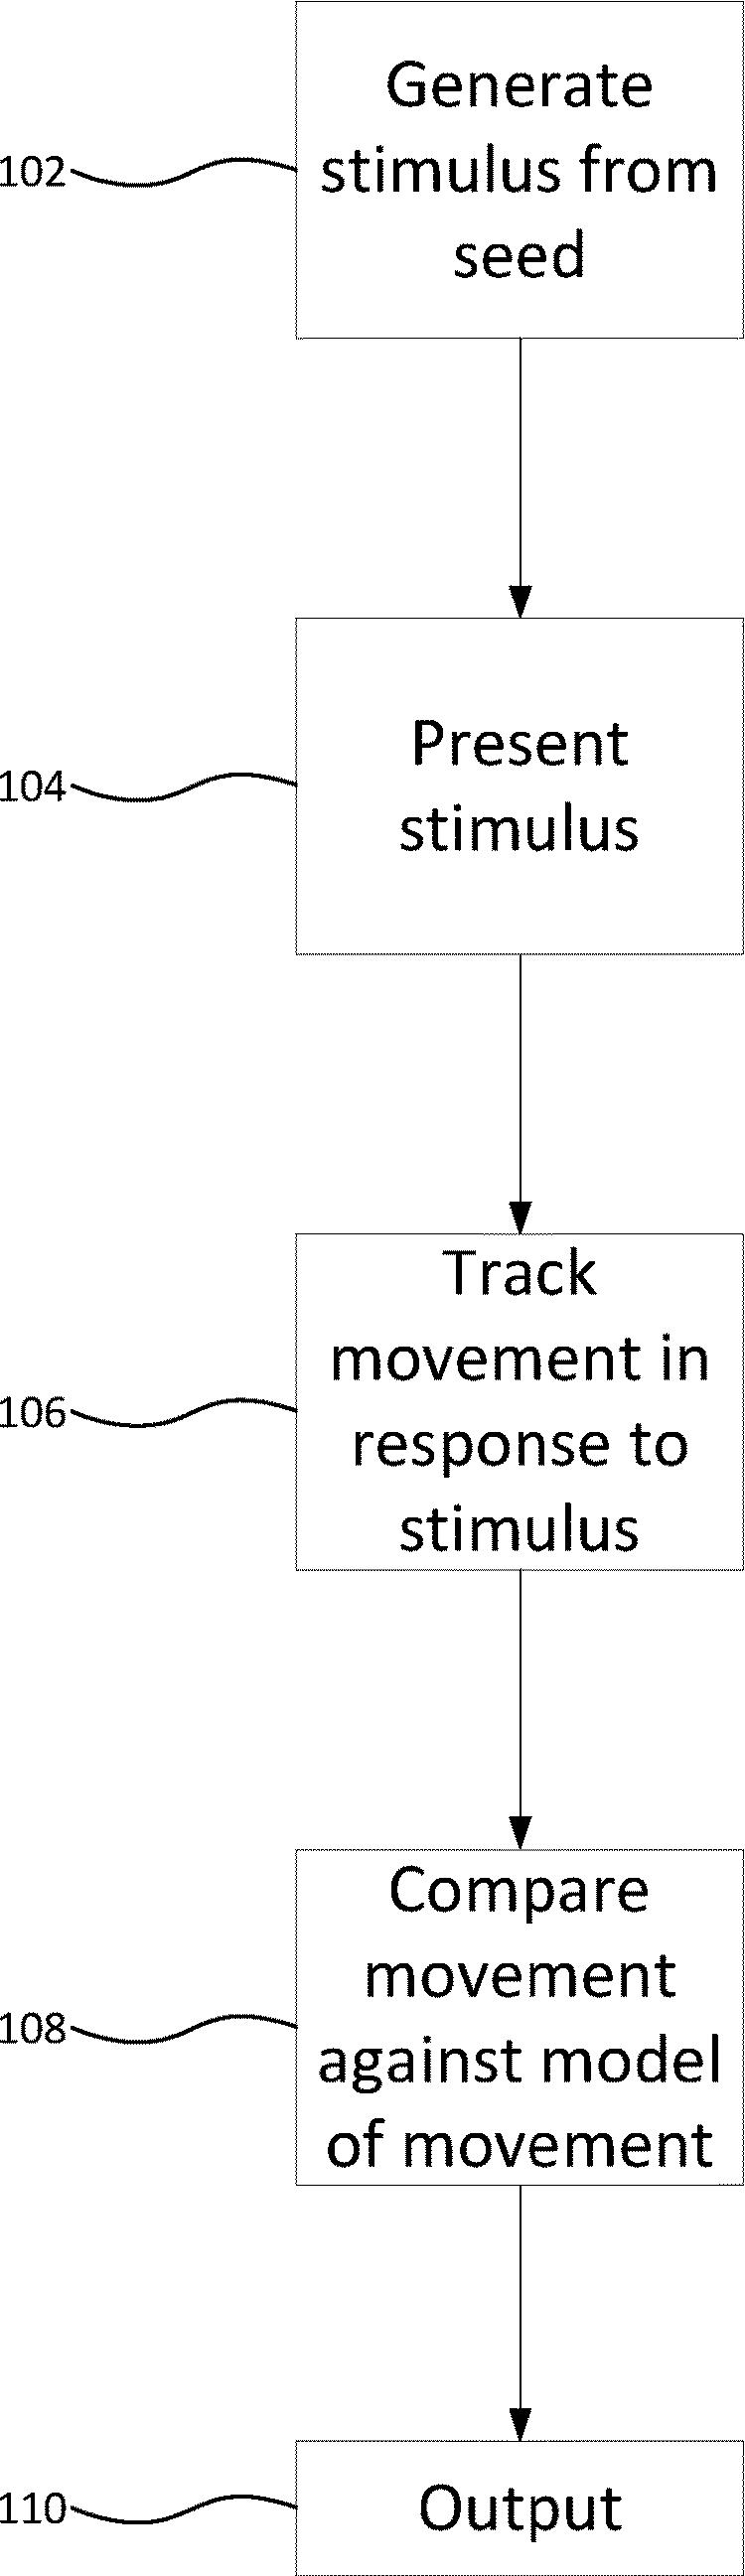 Figure GB2560340A_D0001